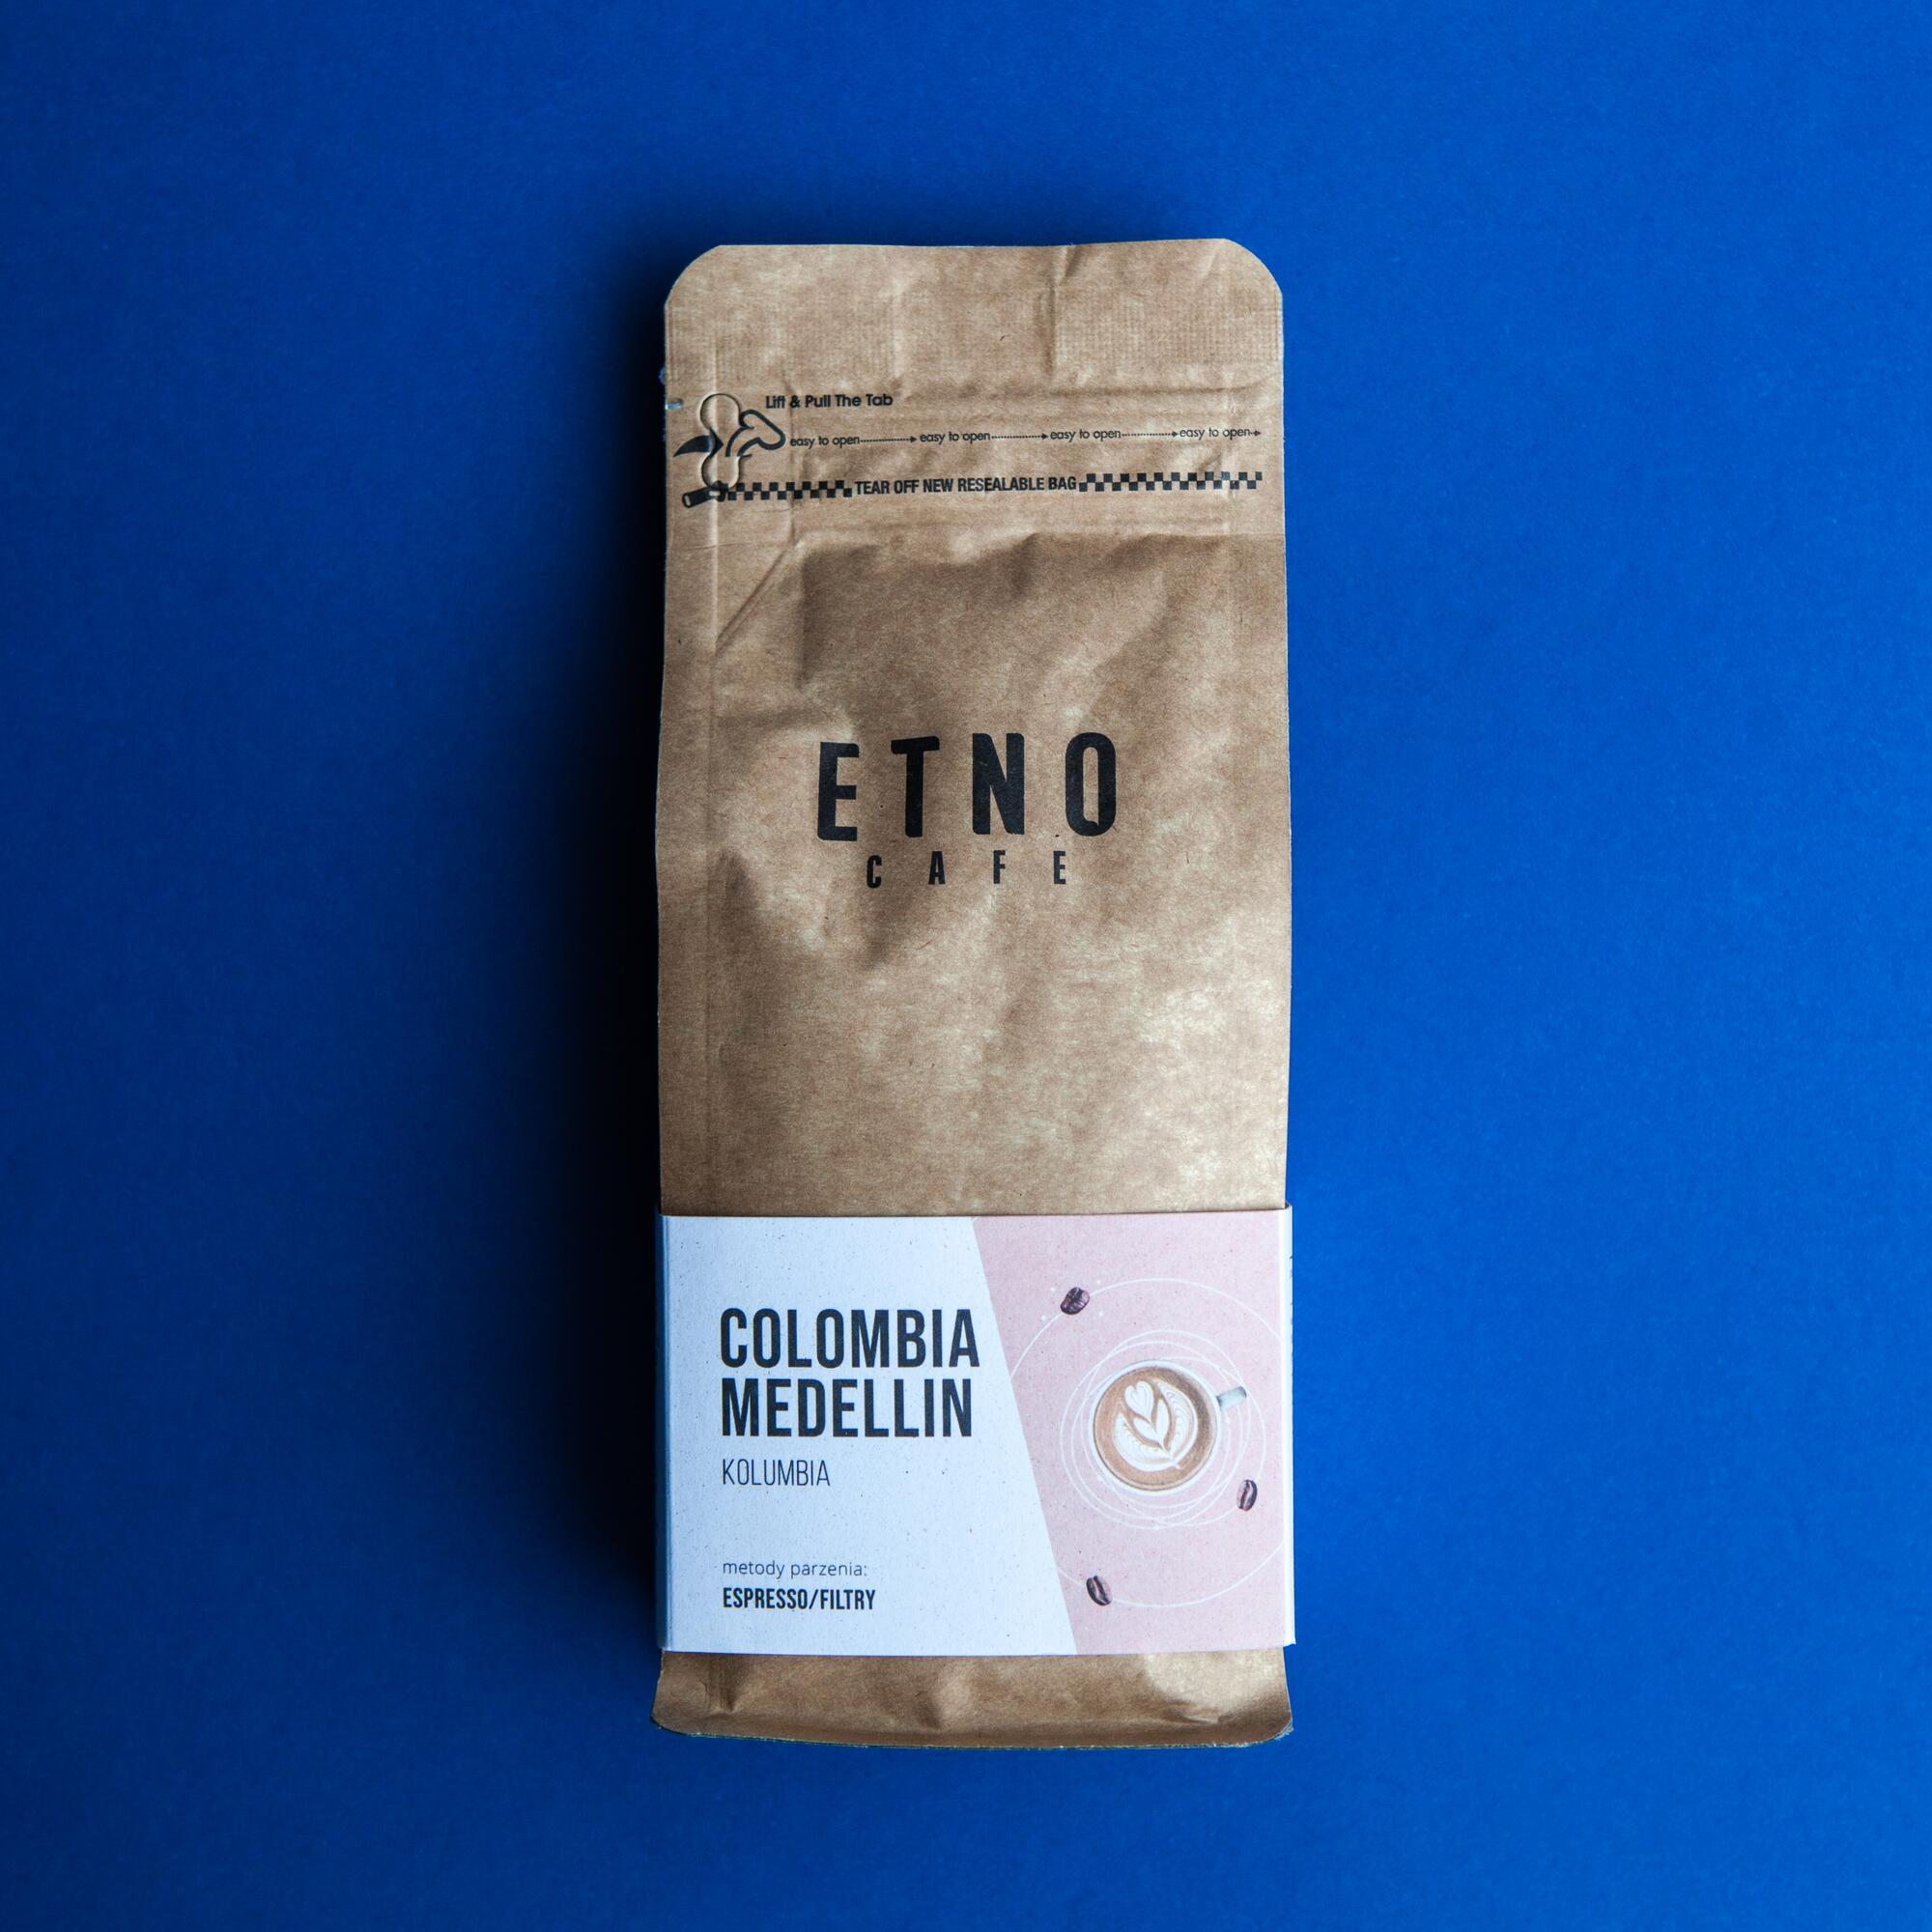 Etno cafe Colombia Medellin 250g - Coffee Gang | JestemSlow.pl